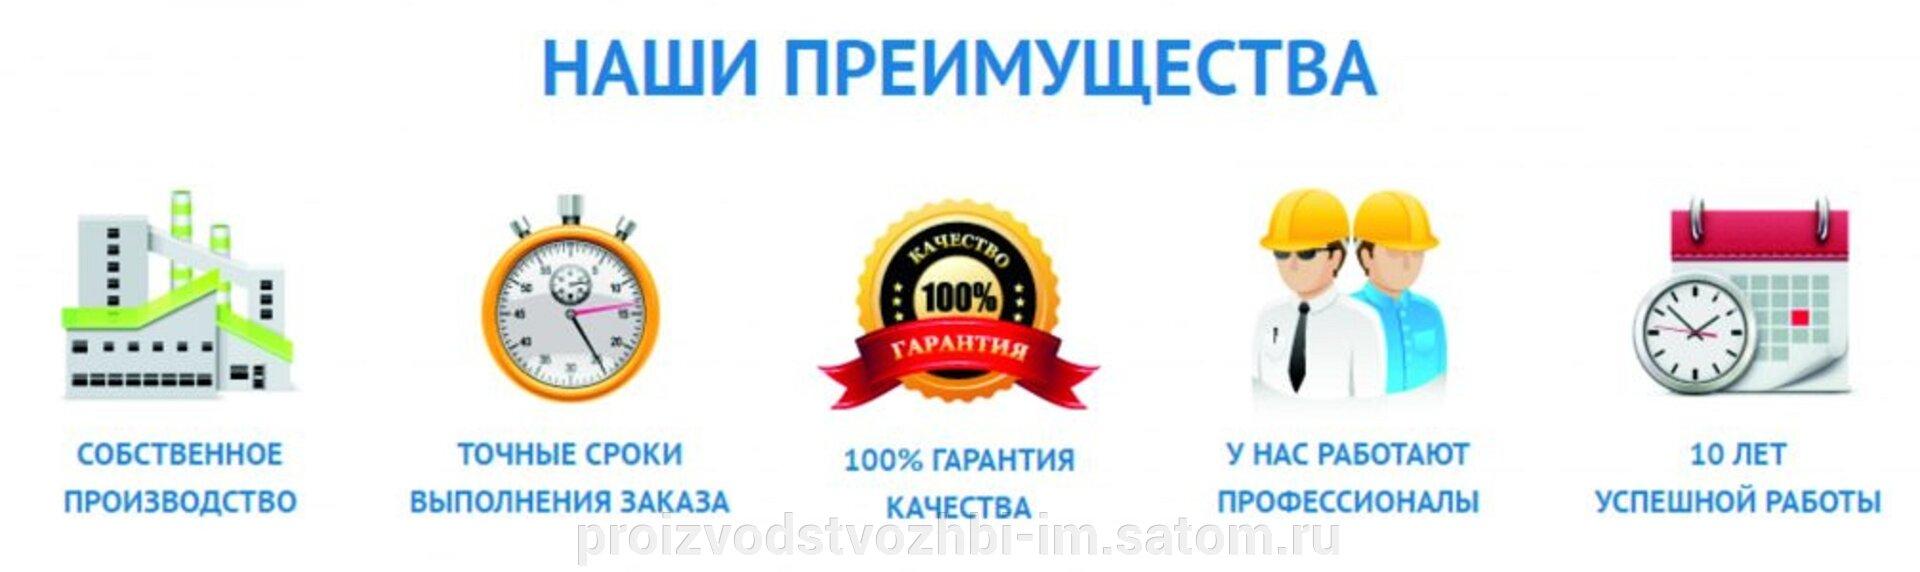 Лоток кабельный ЛК300.120.90-5 - фото pic_ca3ccaecdcfa139a1d379873625f01bd_1920x9000_1.jpg